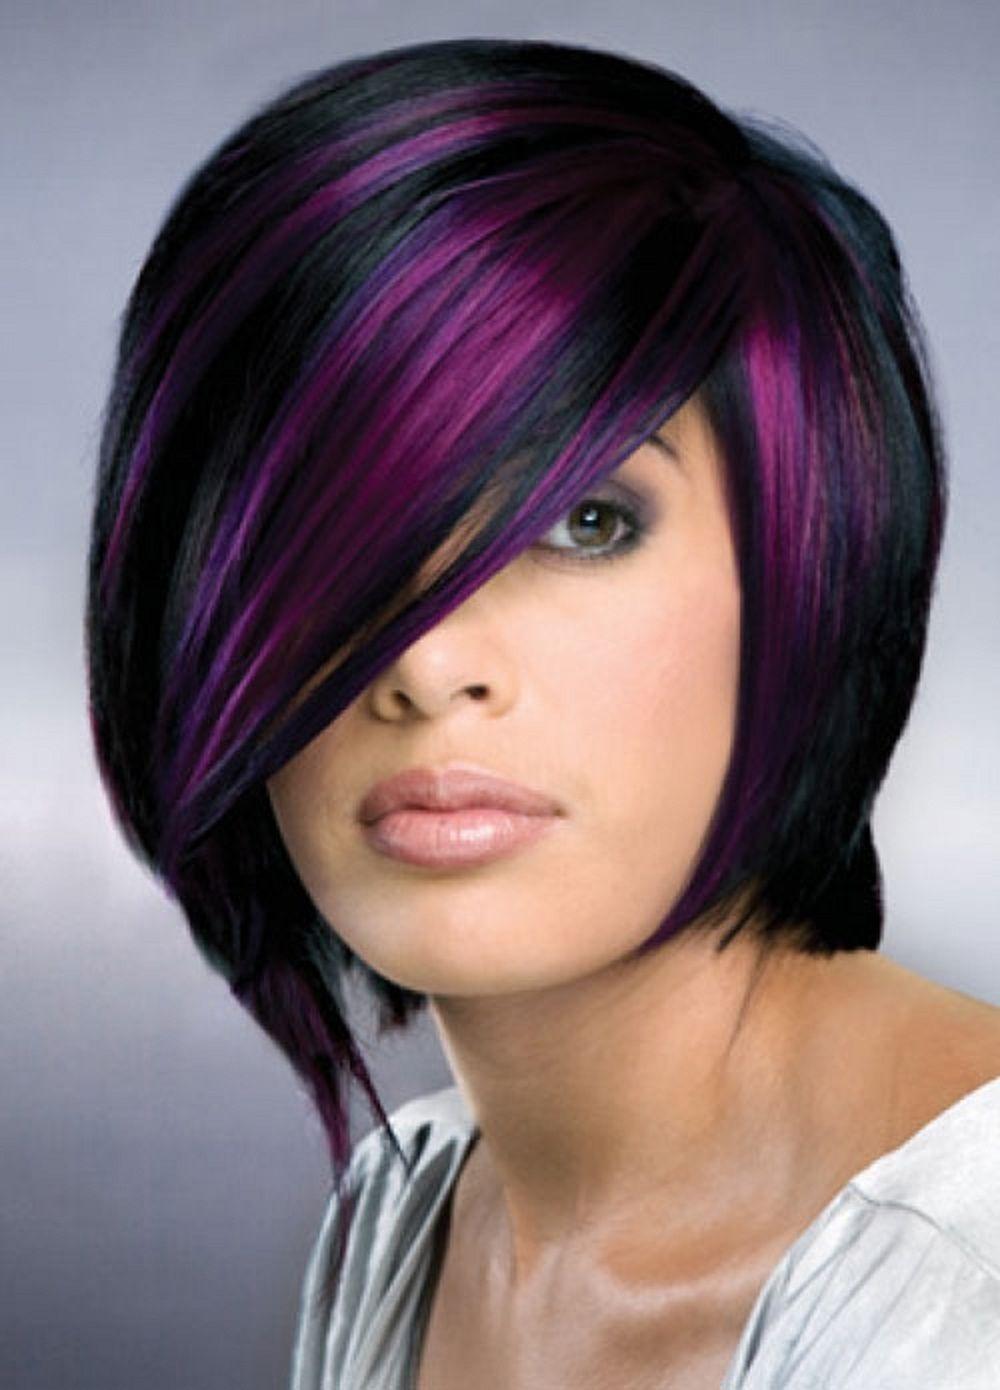 Hair color ideas for short brown hair colours fans share hair